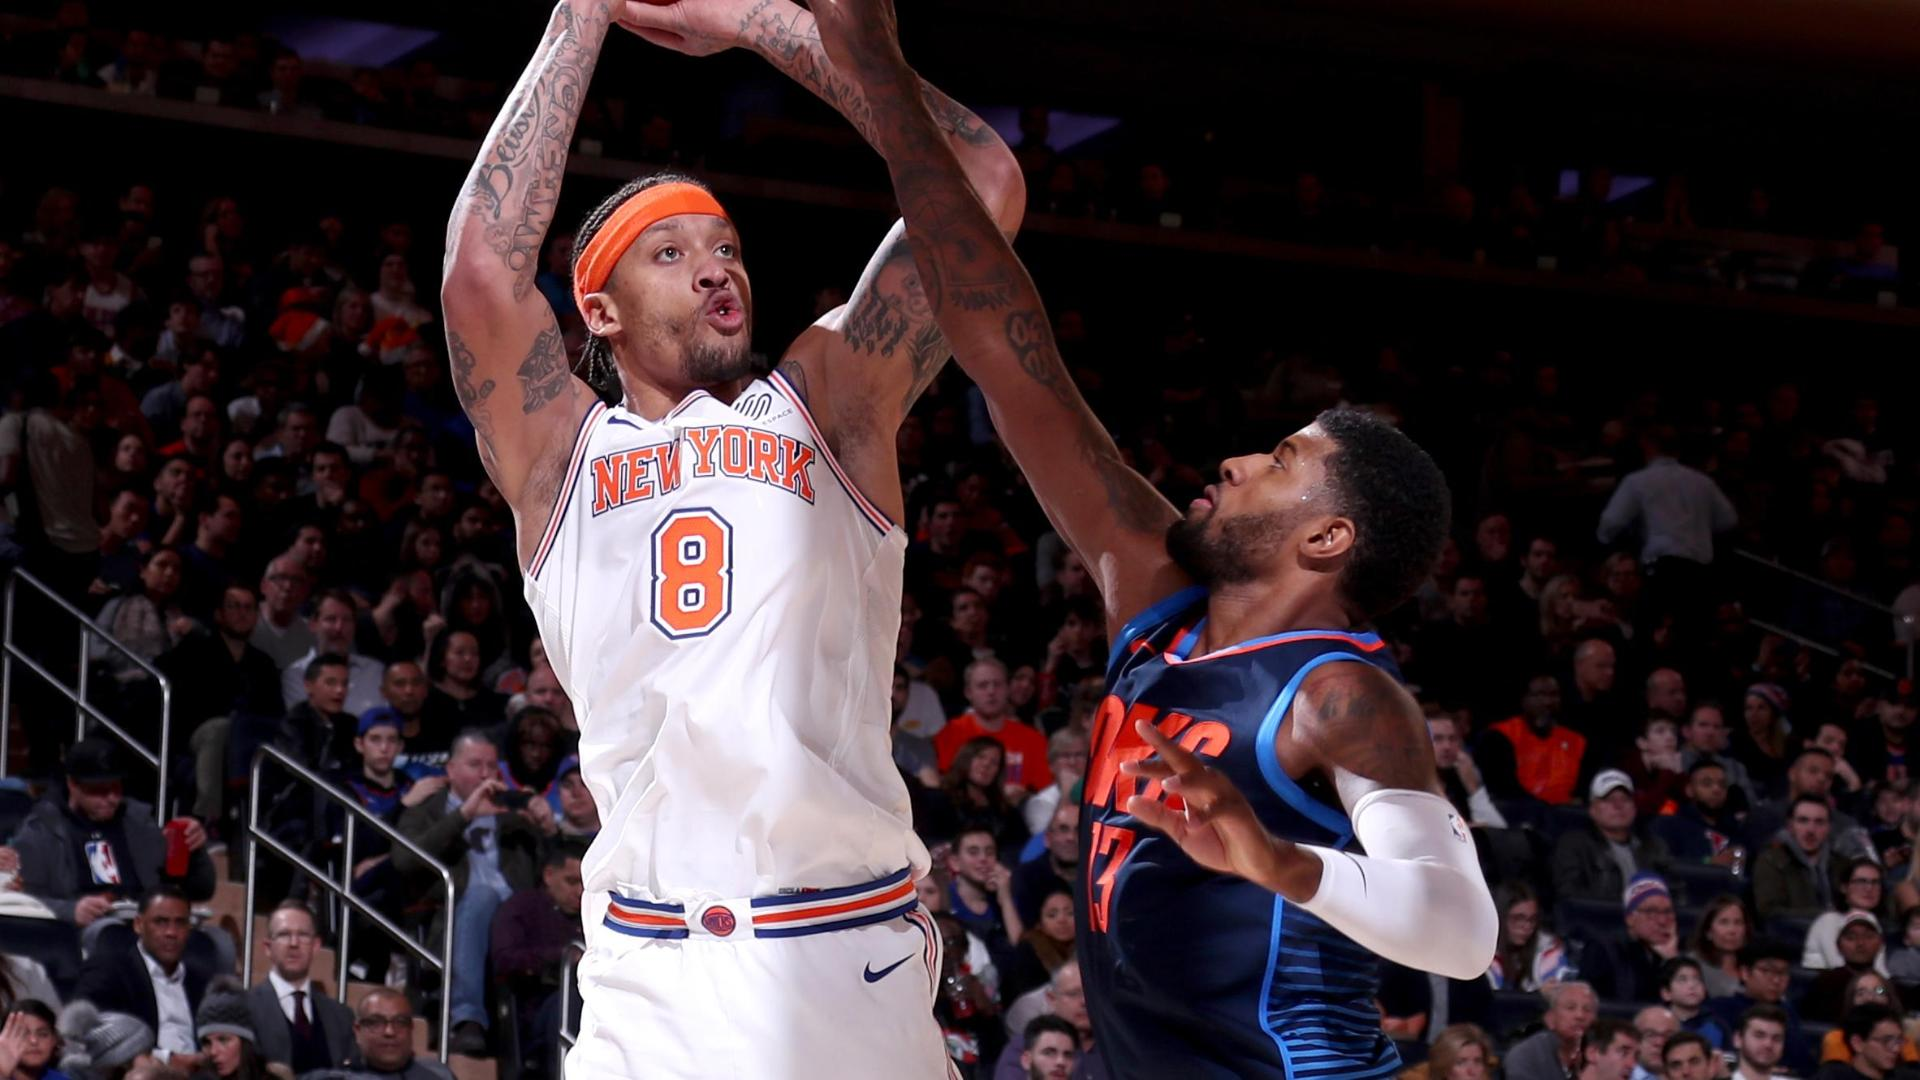 http://a.espncdn.com/media/motion/2017/1217/dm_171216_NBA_Knicks_Beasley_best_of_30_point_nigh196/dm_171216_NBA_Knicks_Beasley_best_of_30_point_nigh196.jpg